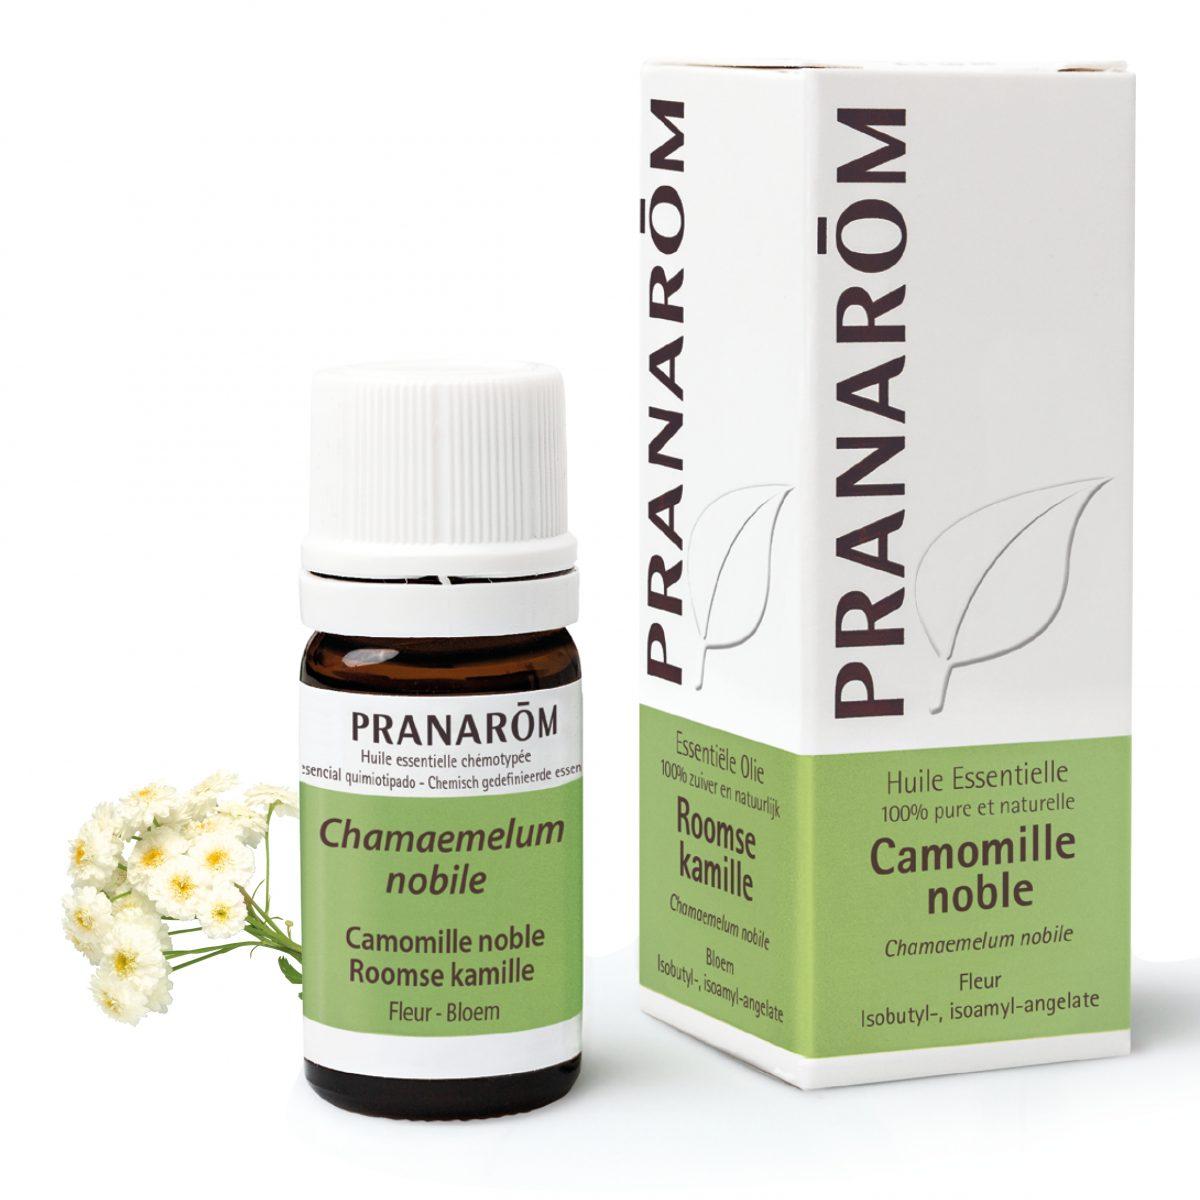 huile essentielle de camomille noble